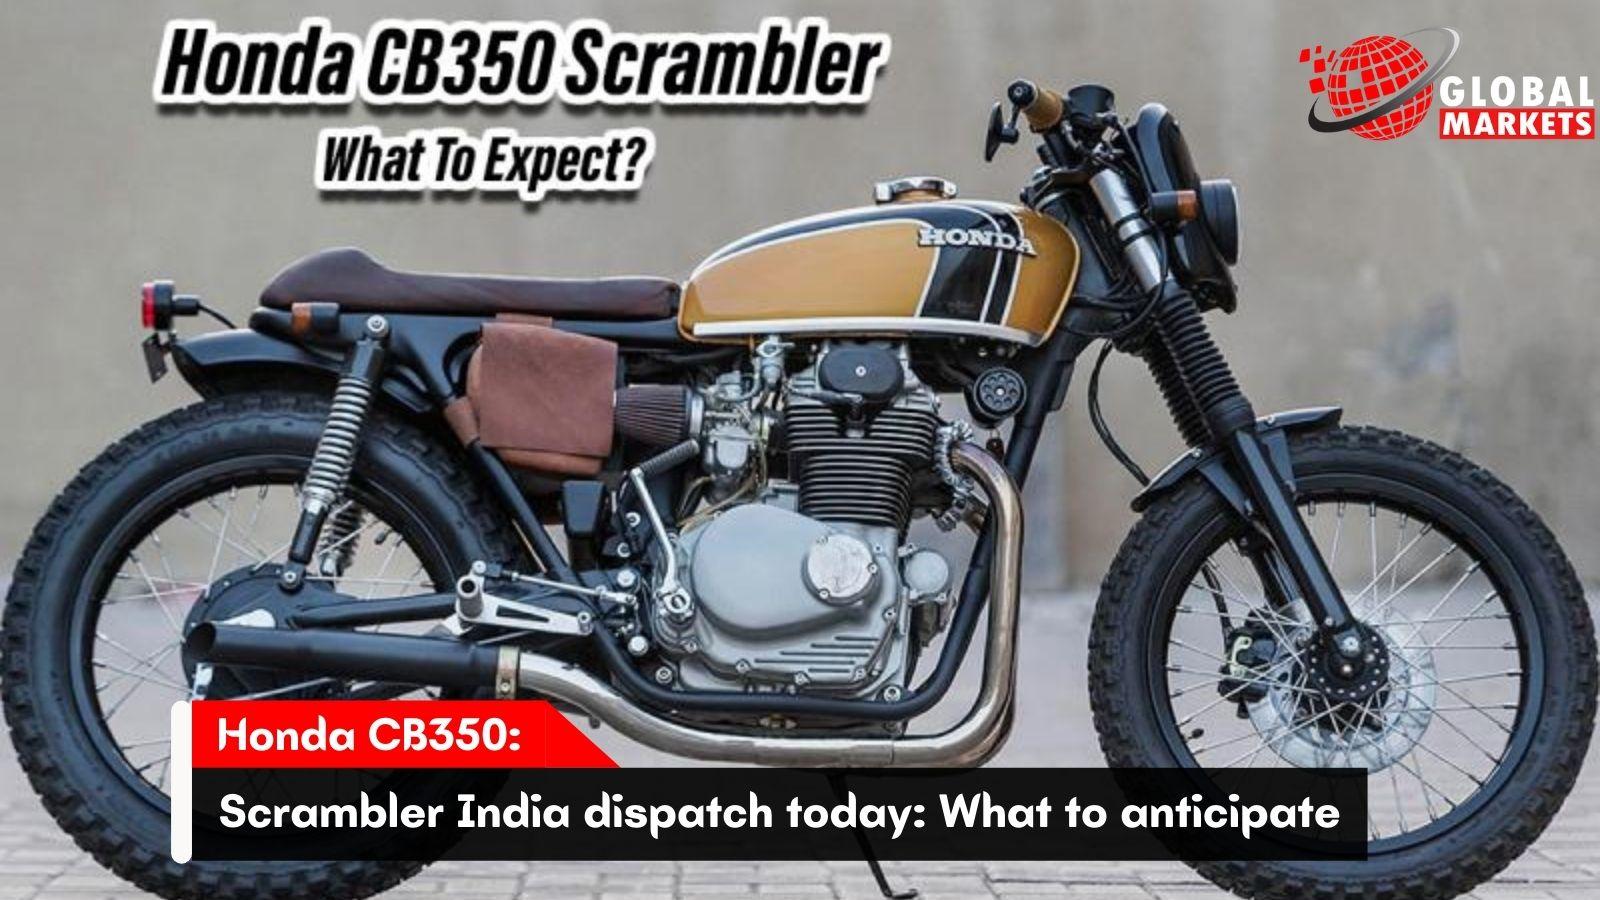 Honda CB350 Scrambler India dispatch today: What to anticipate